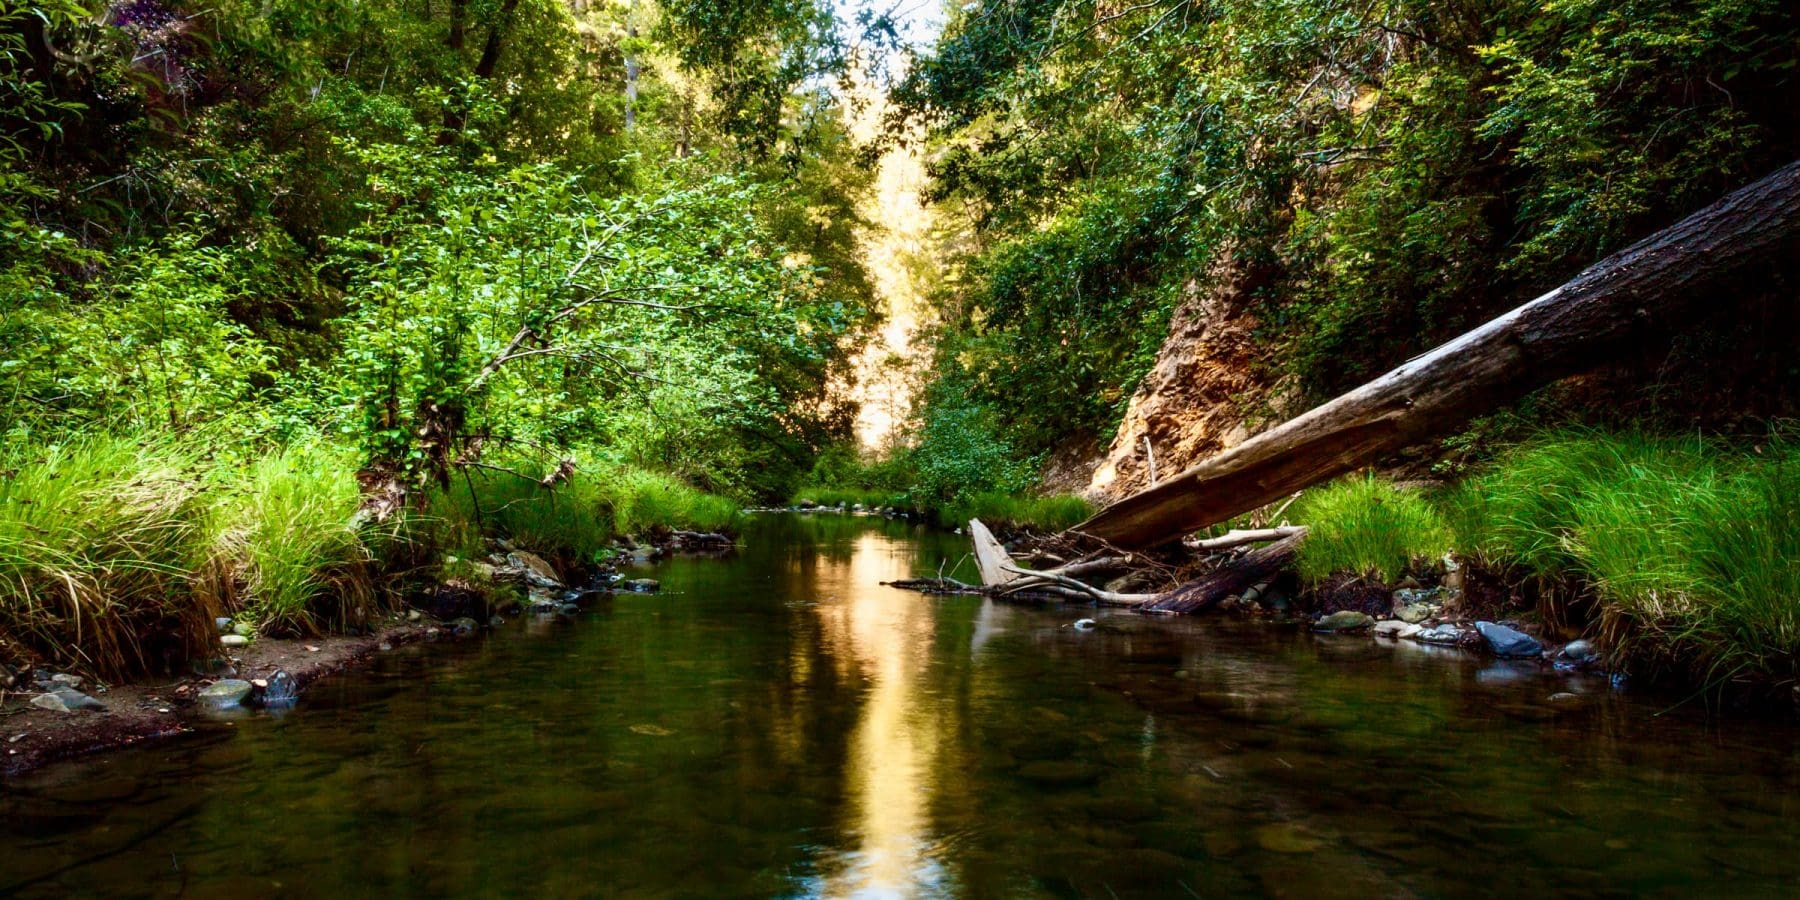 River at Portola Redwoods State Park